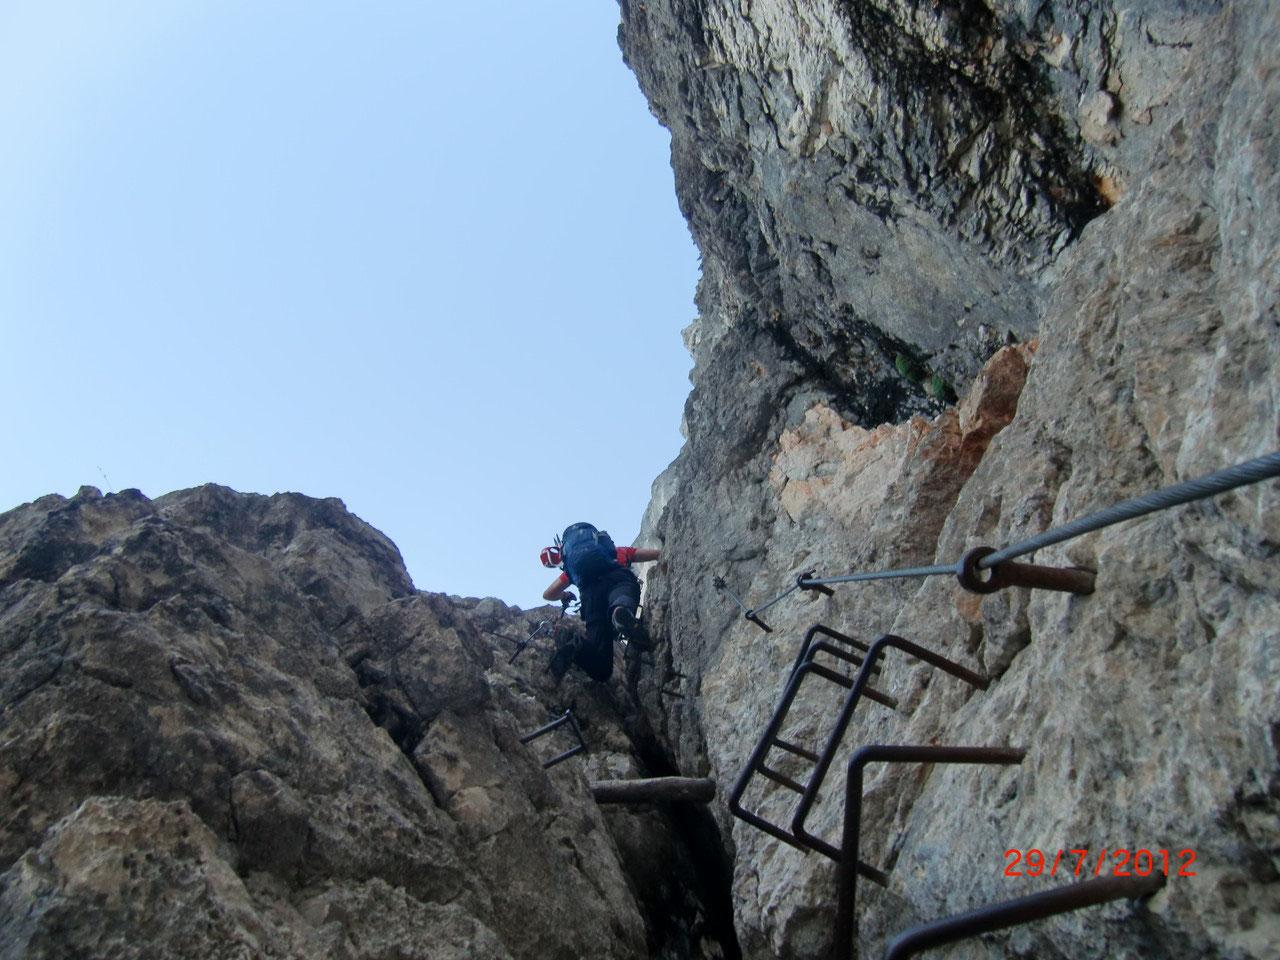 Klettersteig Julische Alpen : Mala mojstrovka m sg b c ii julische alpen